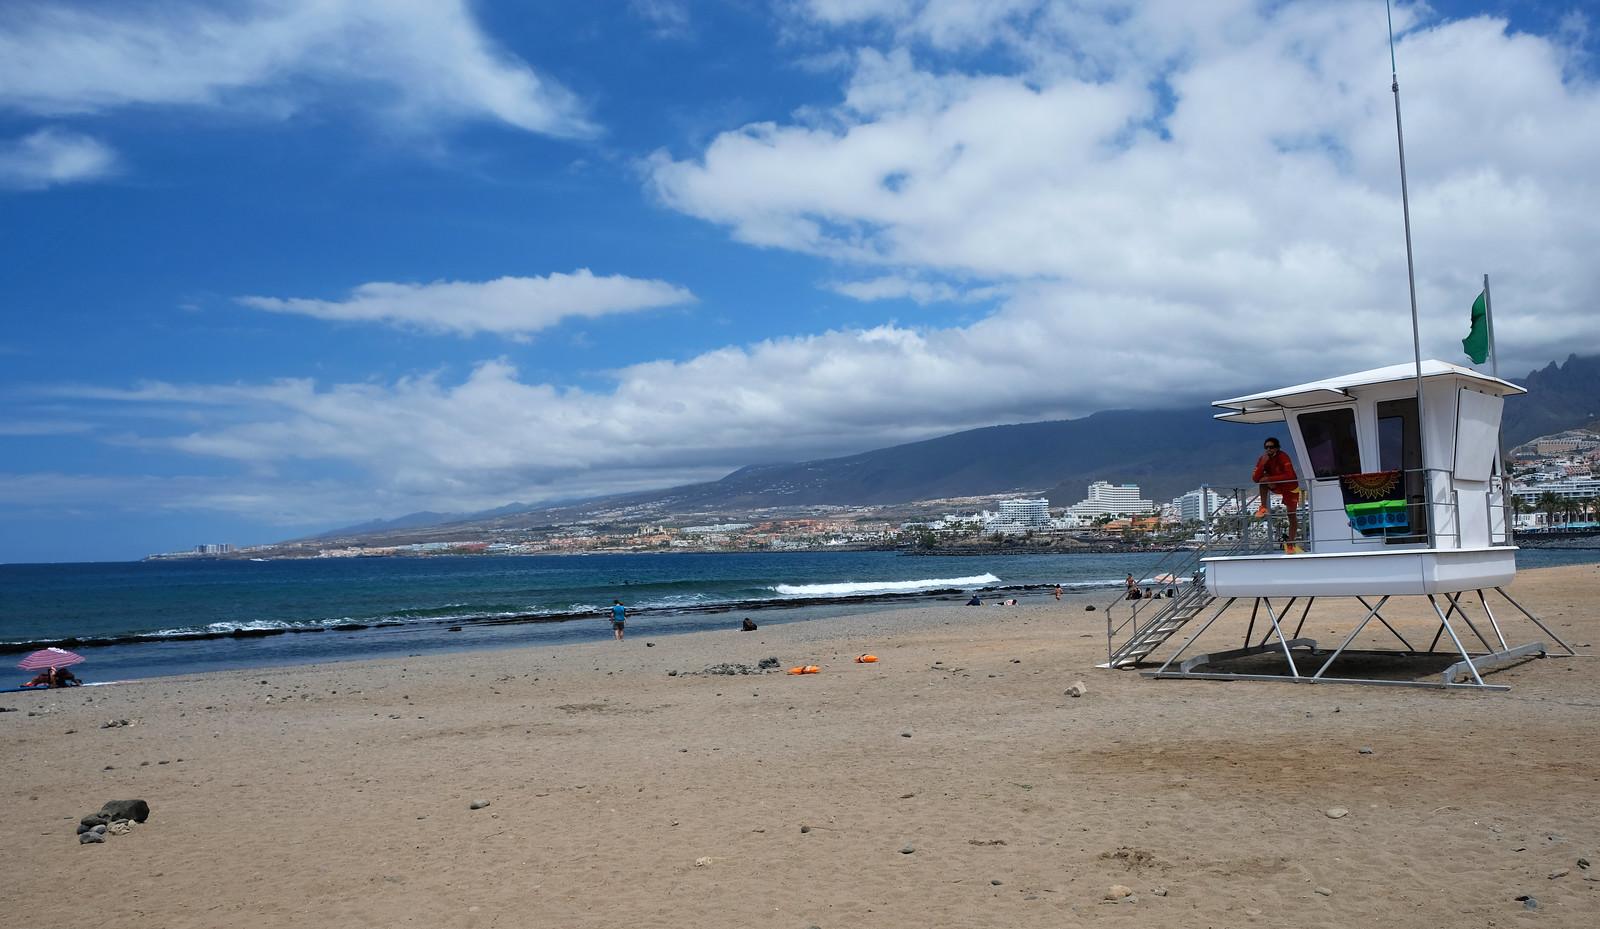 Playa Honda, Playa de las Américas, Tenerife